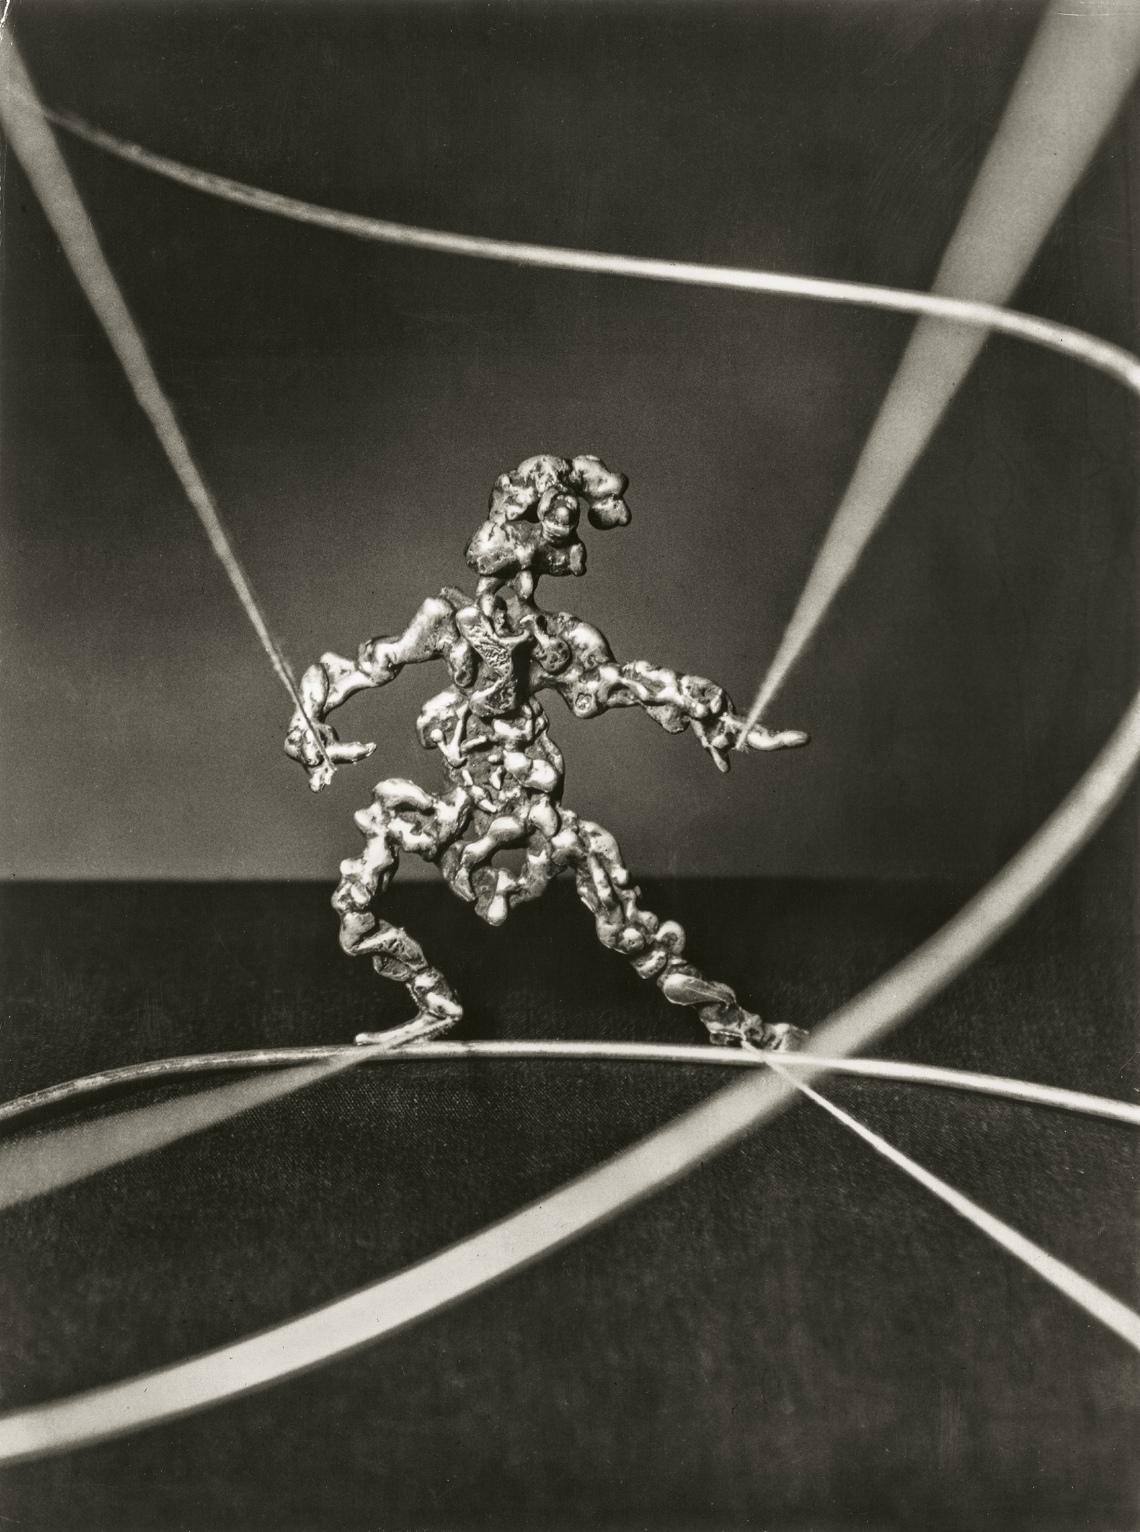 Sam Kramer, Antic Figure, hanger, circa 1946. Fotografie door Marvin Koner, courtesy Marc McDonald©